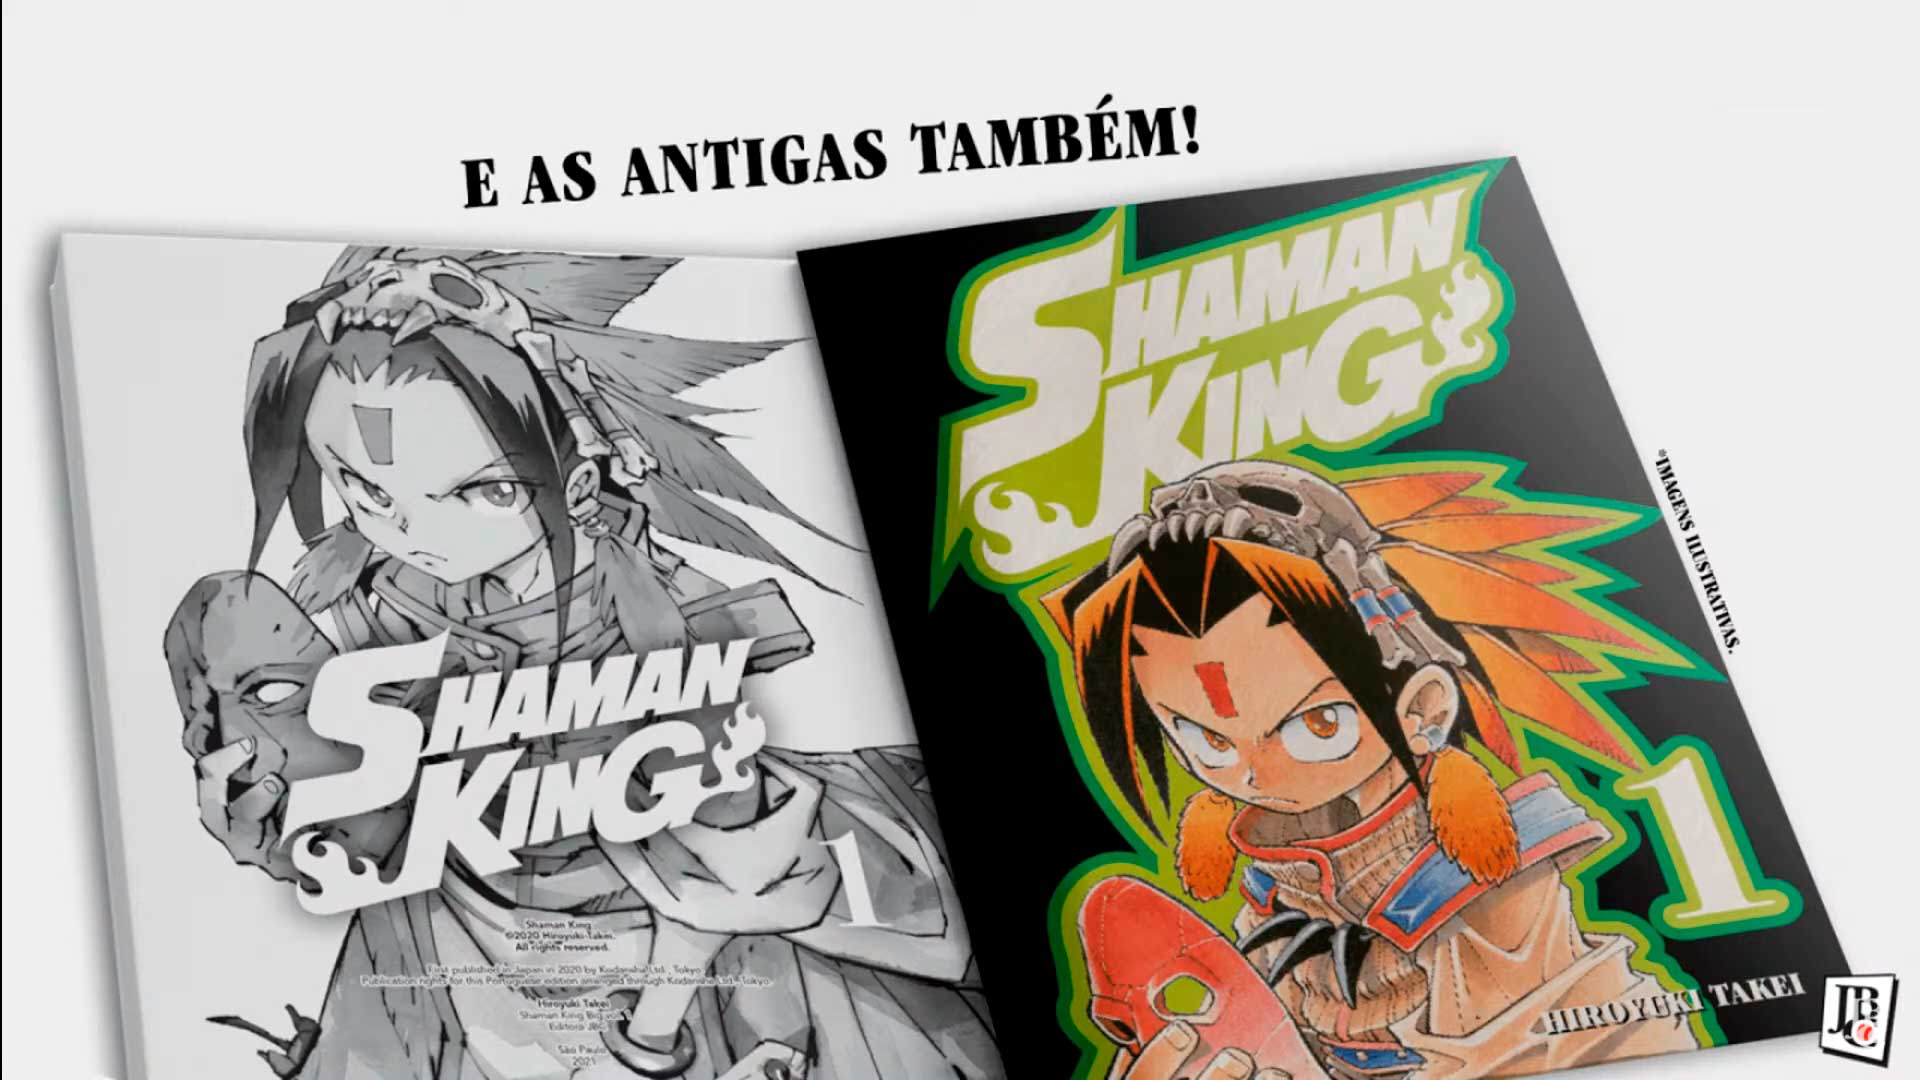 Shaman King Big Vol. 1 - Capas antigas